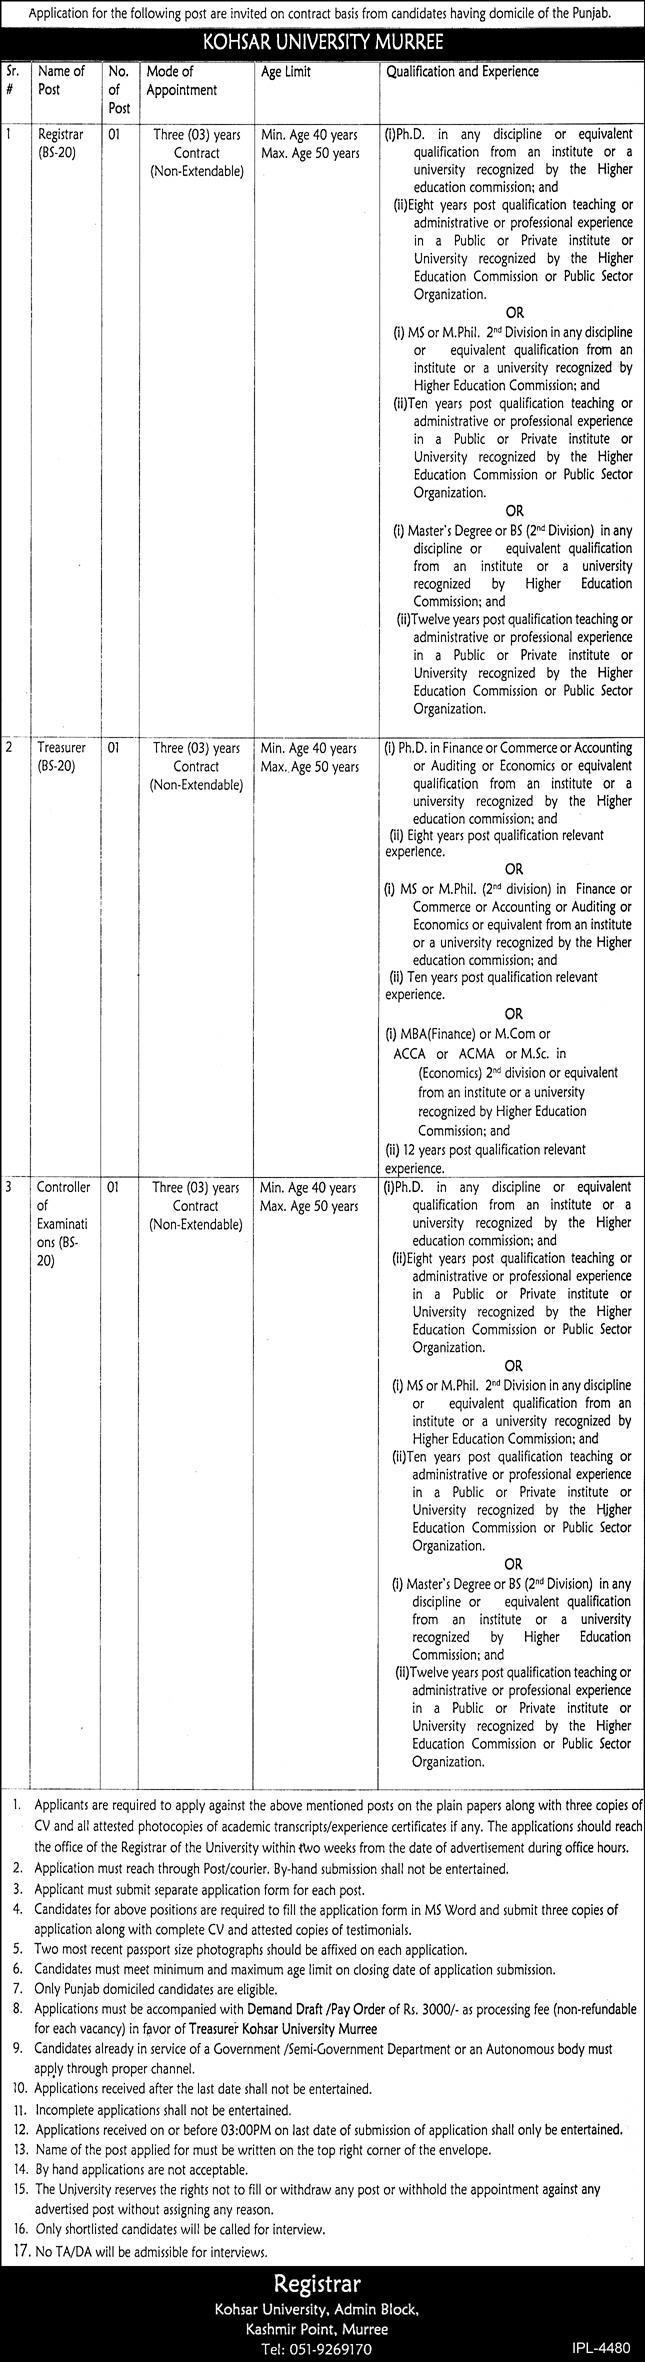 Kohsar University Murree jobs 2021 latest advertisement